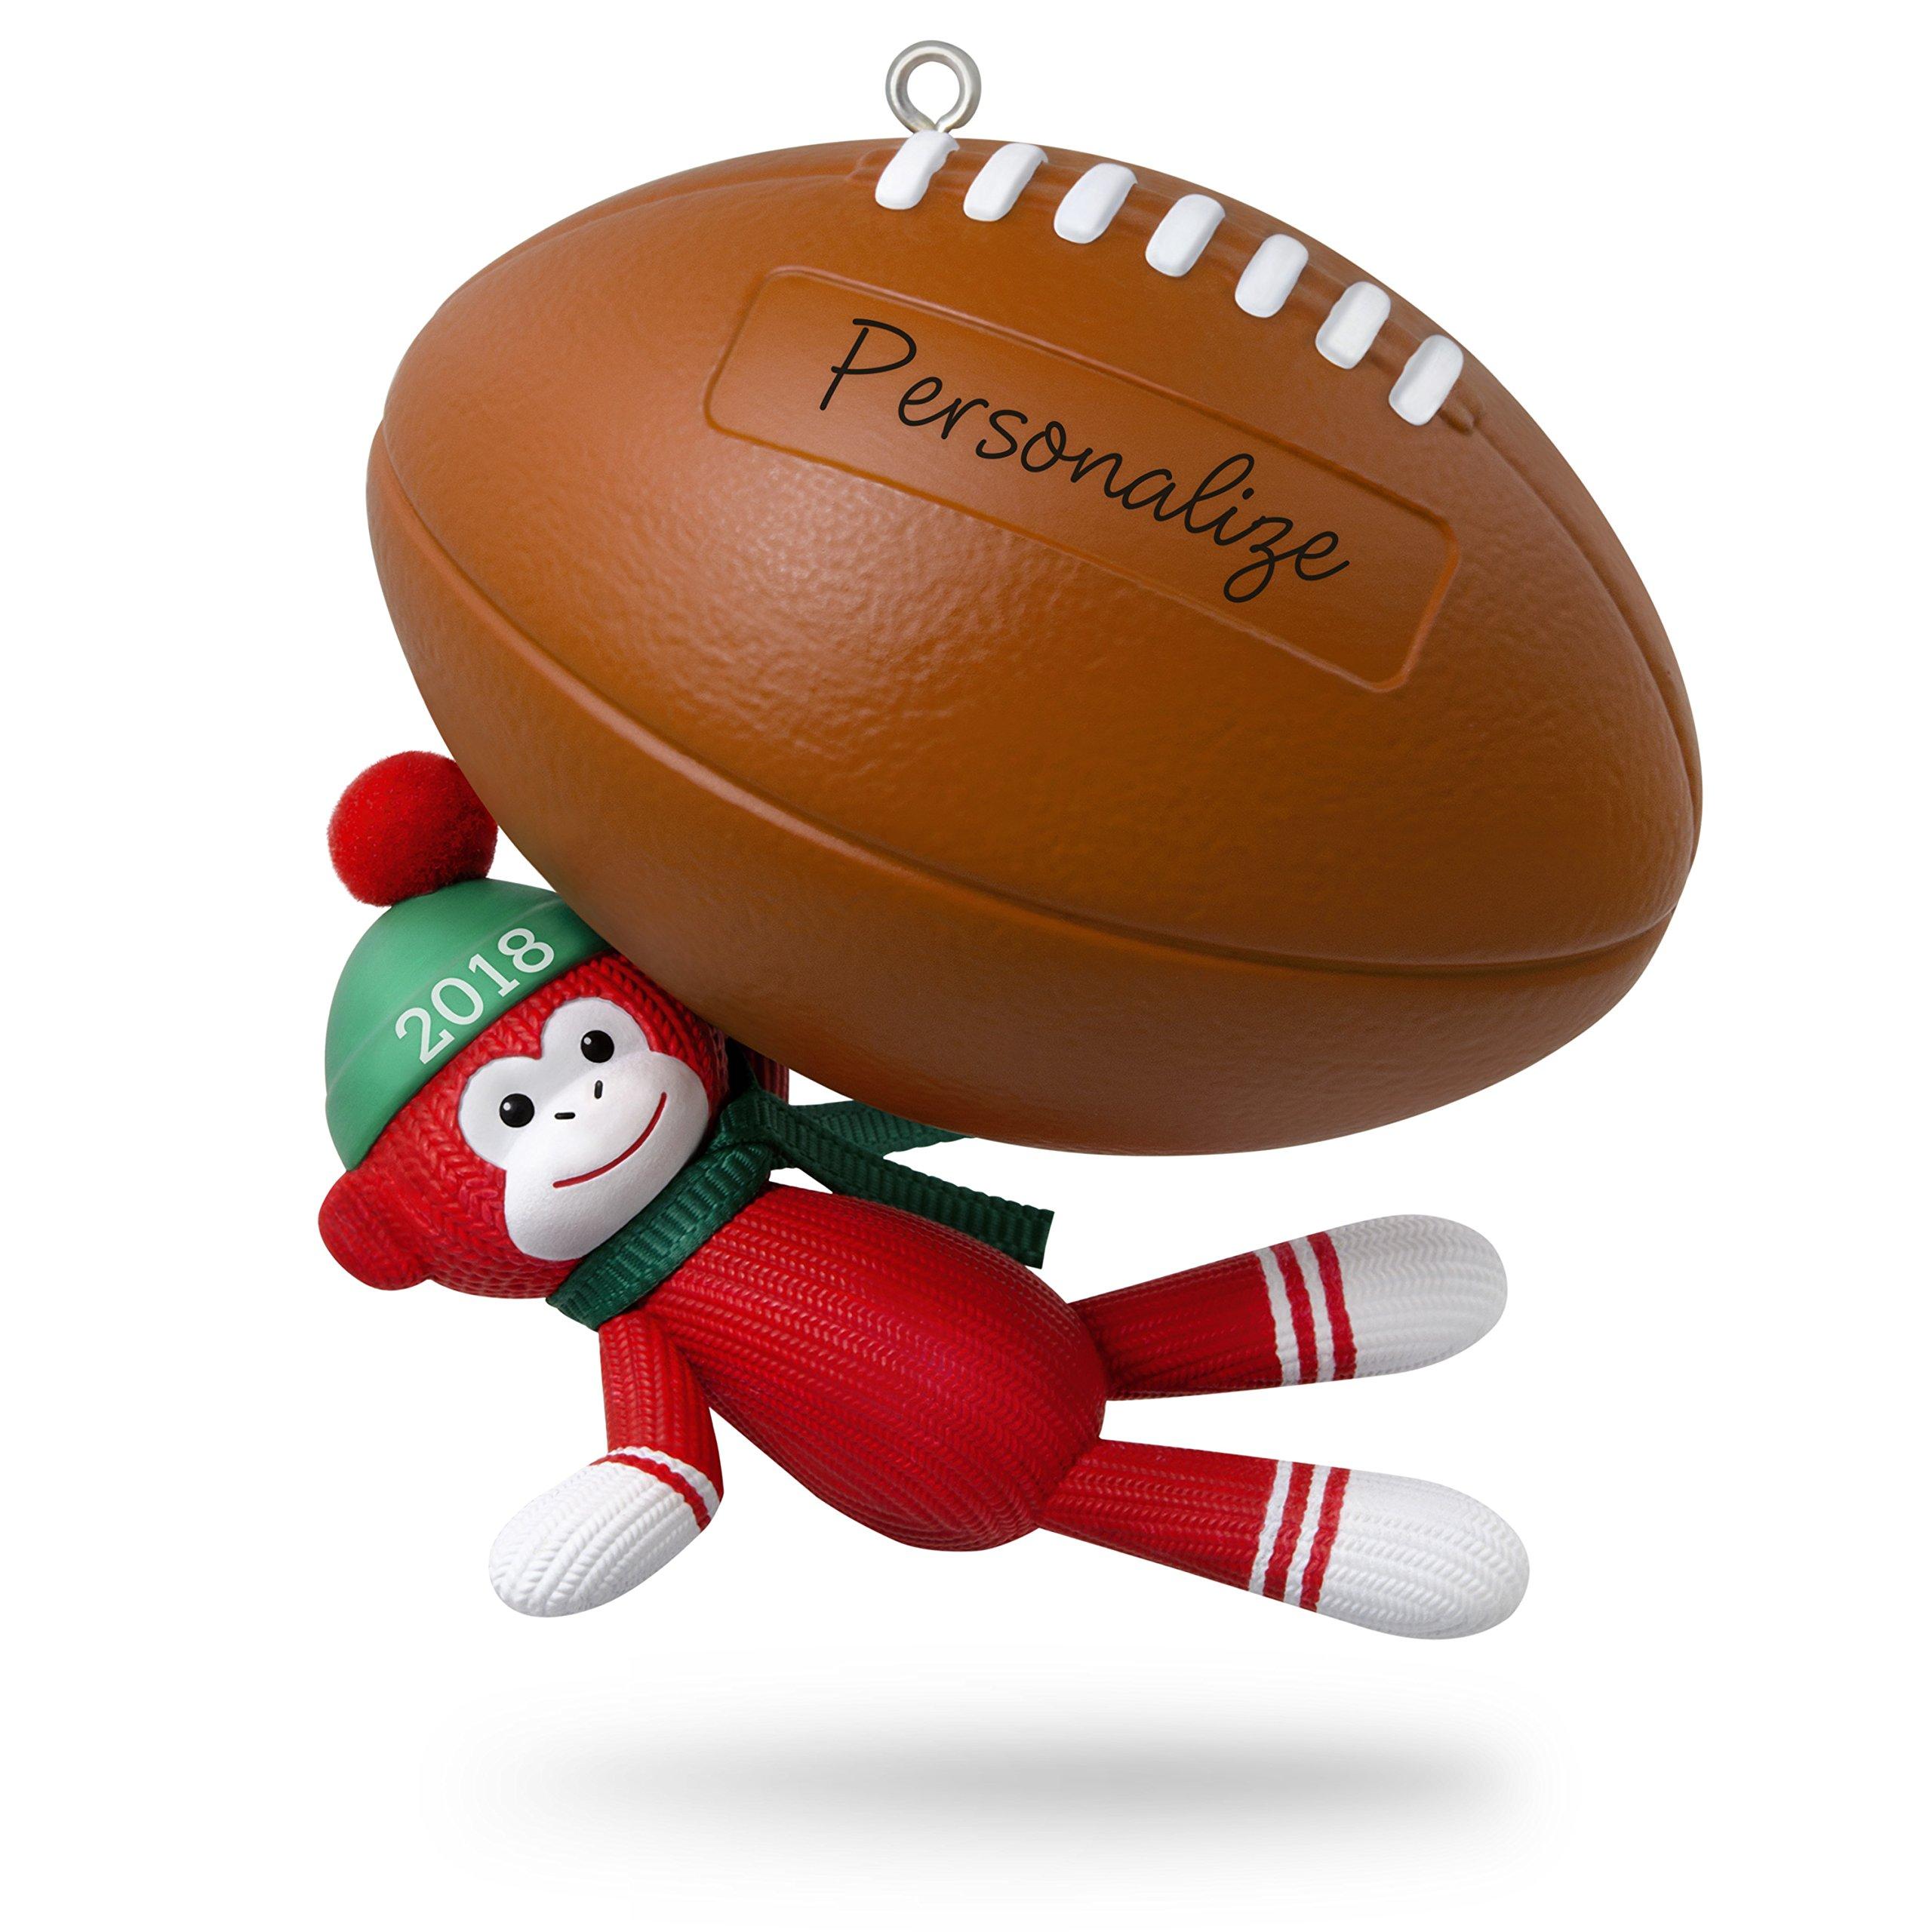 Hallmark Keepsake Personalized Christmas Ornament 2018 Year Dated, Football Star Sock Monkey